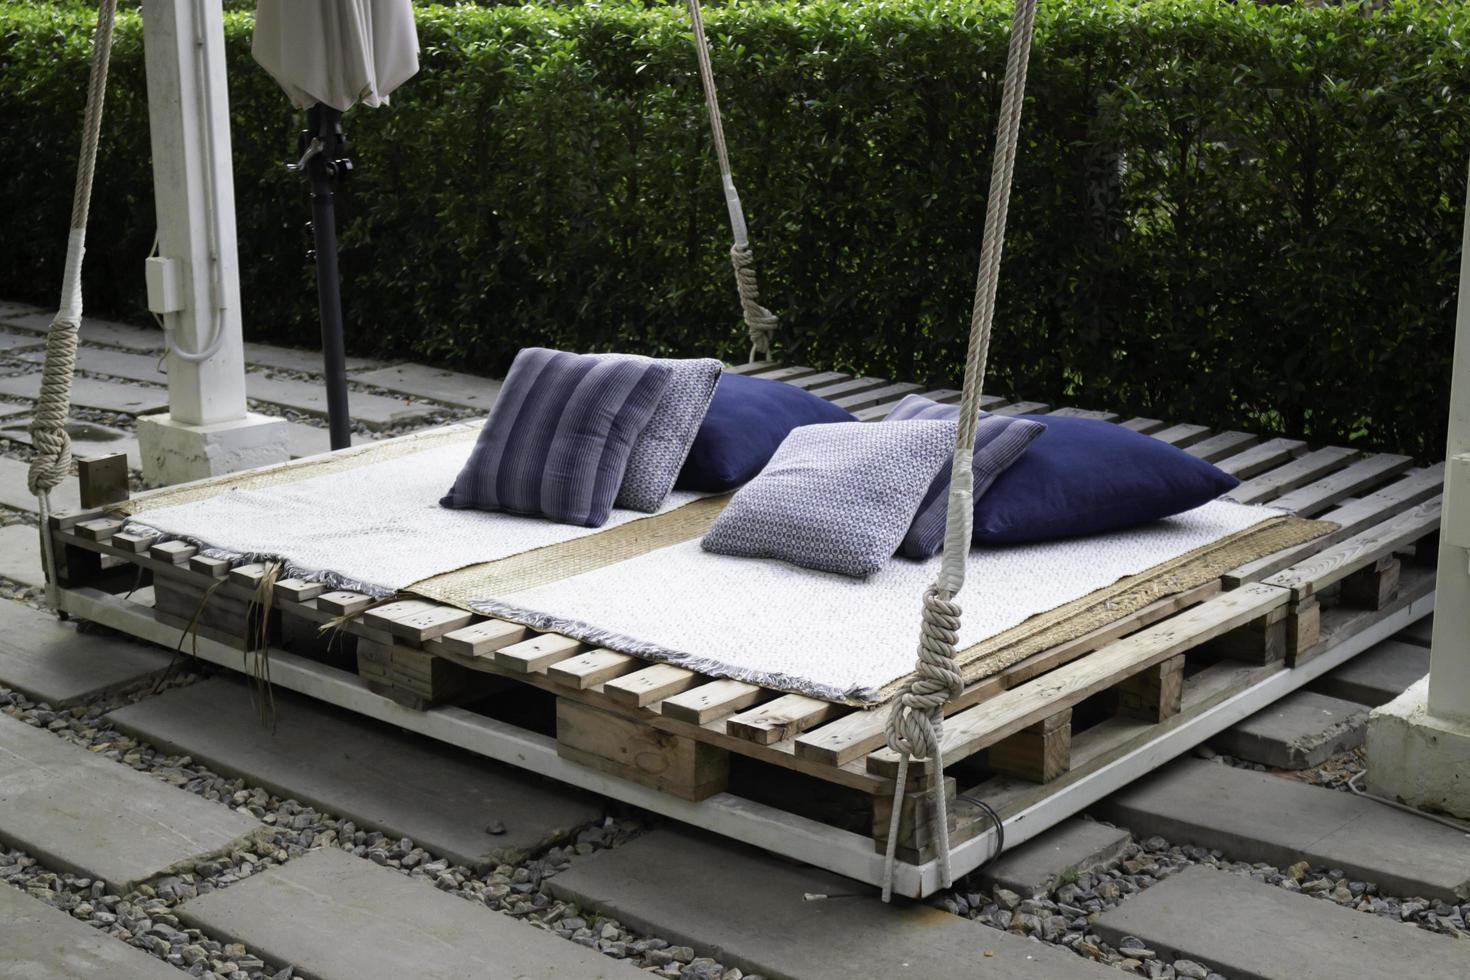 cama de plataforma de jardín foto